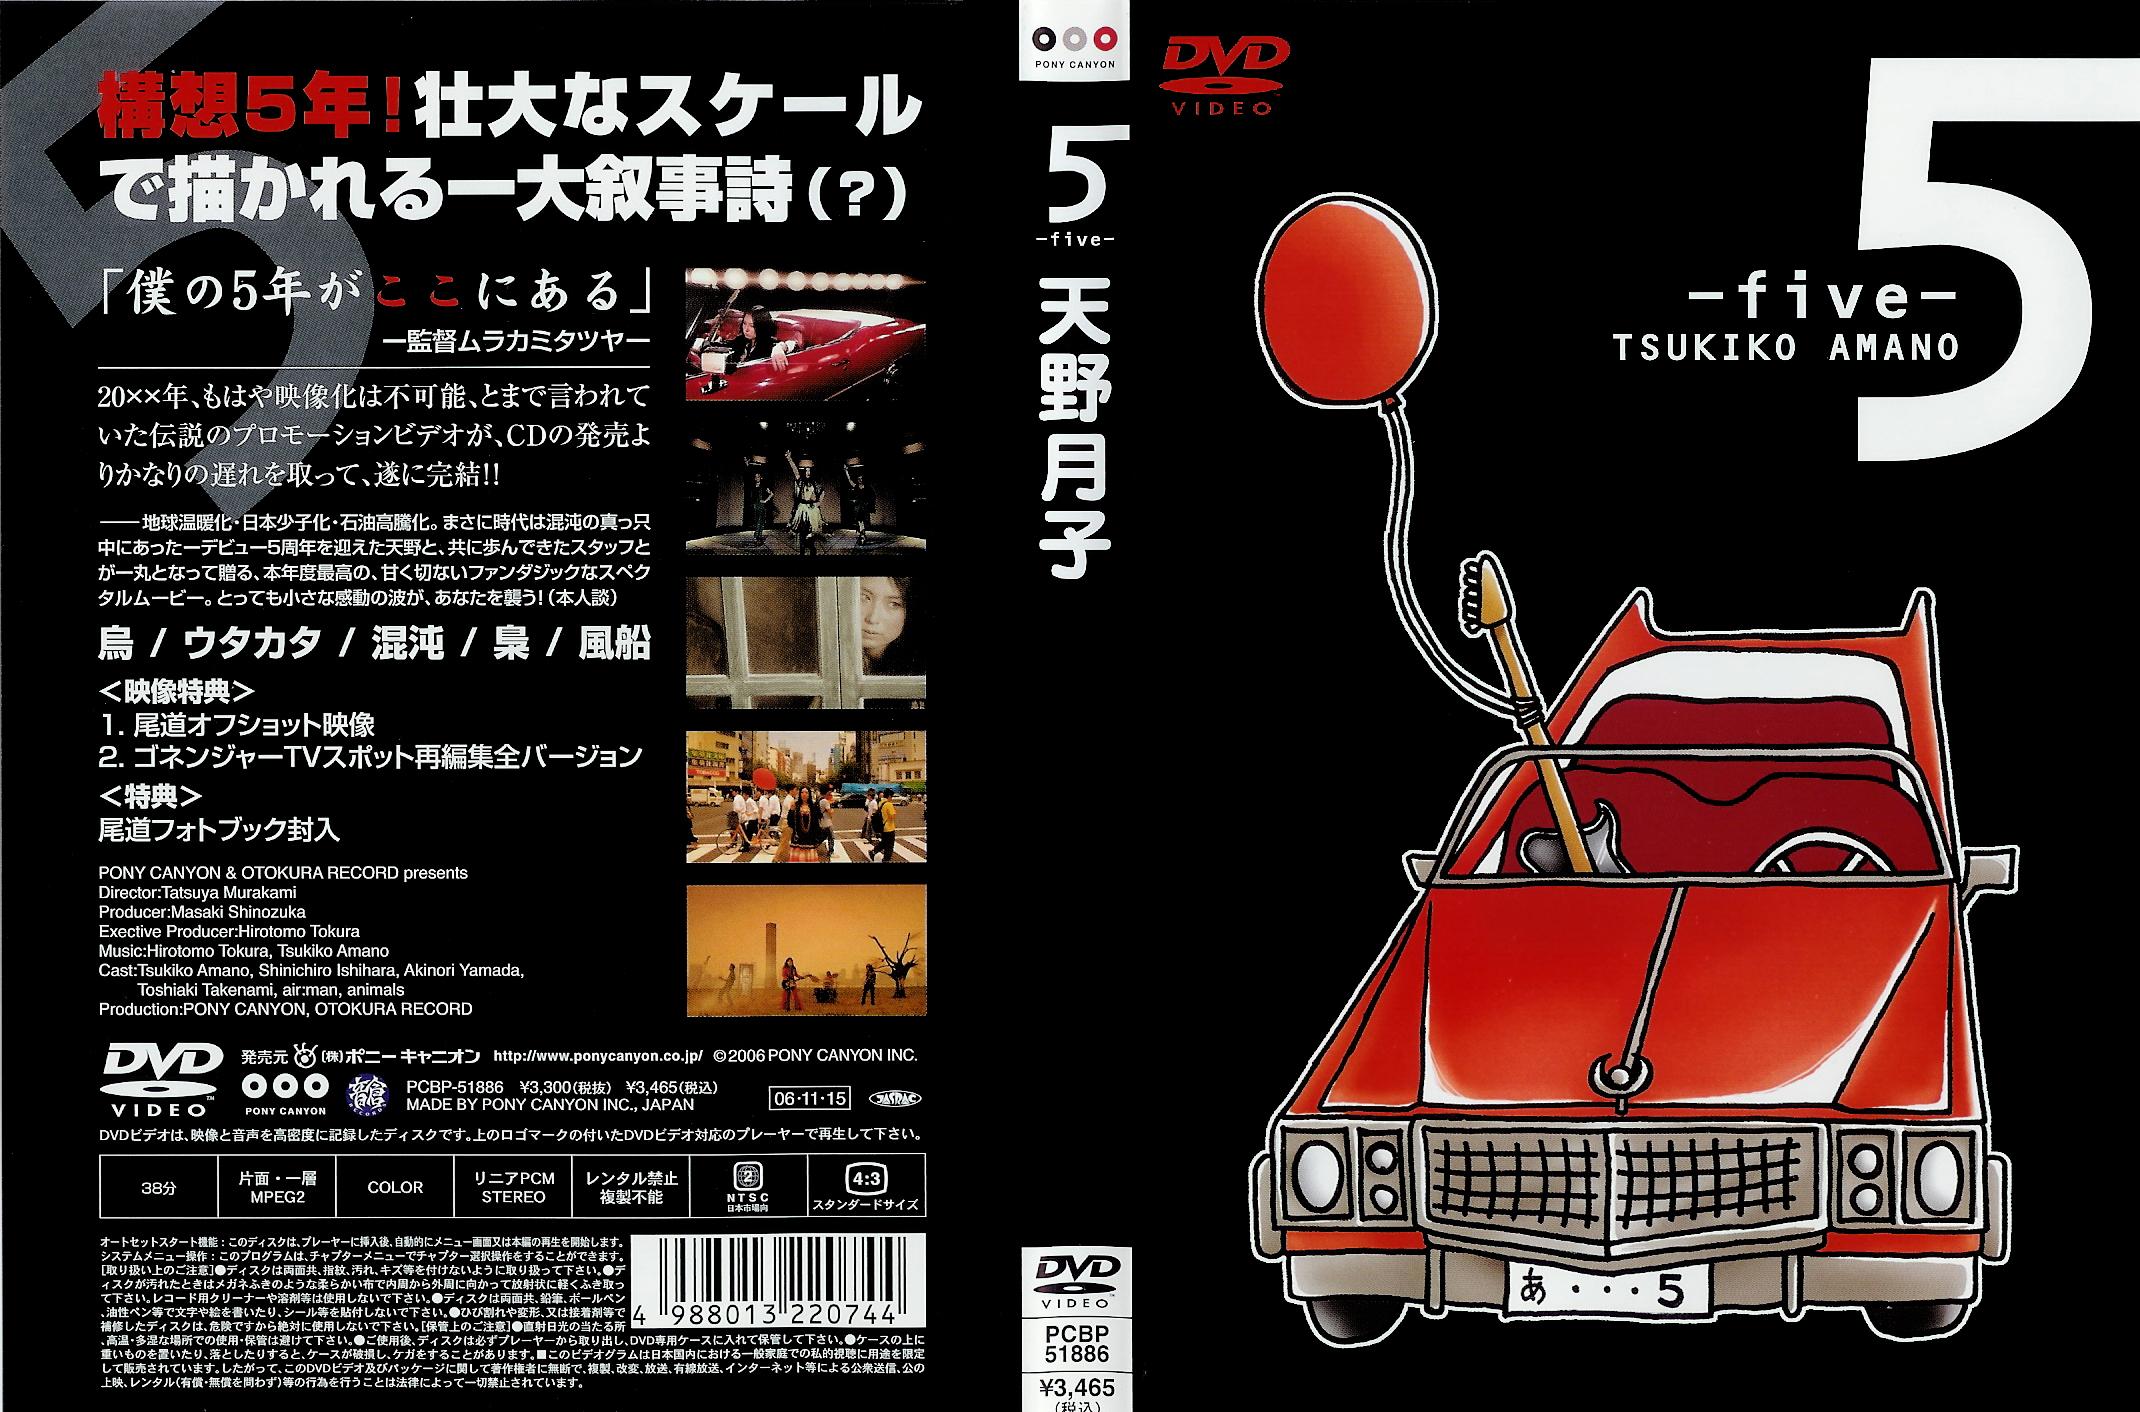 20180721.0736.1 Tsuki Amano - 5 -five- (DVD) (JPOP.ru) cover.jpg